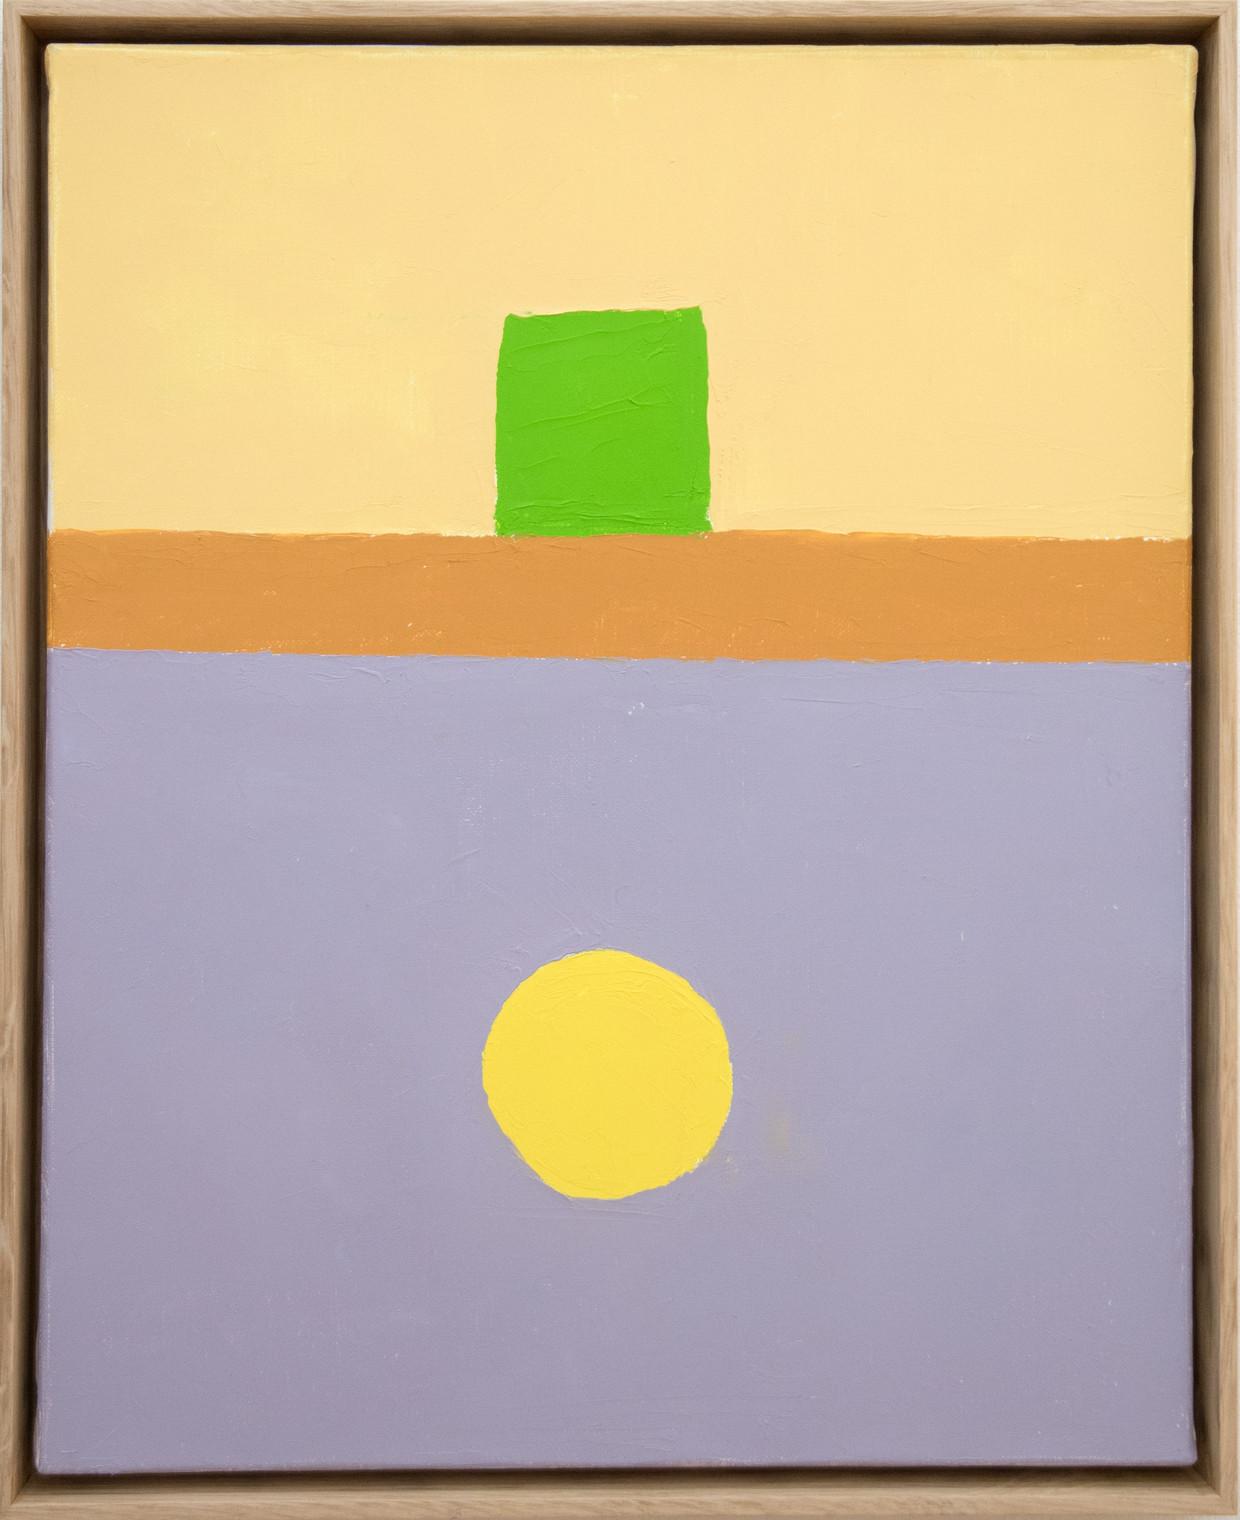 Etel Adnan, Untitled (2018) Beeld Sfeir-Semler Gallery Beirut/Hamburg